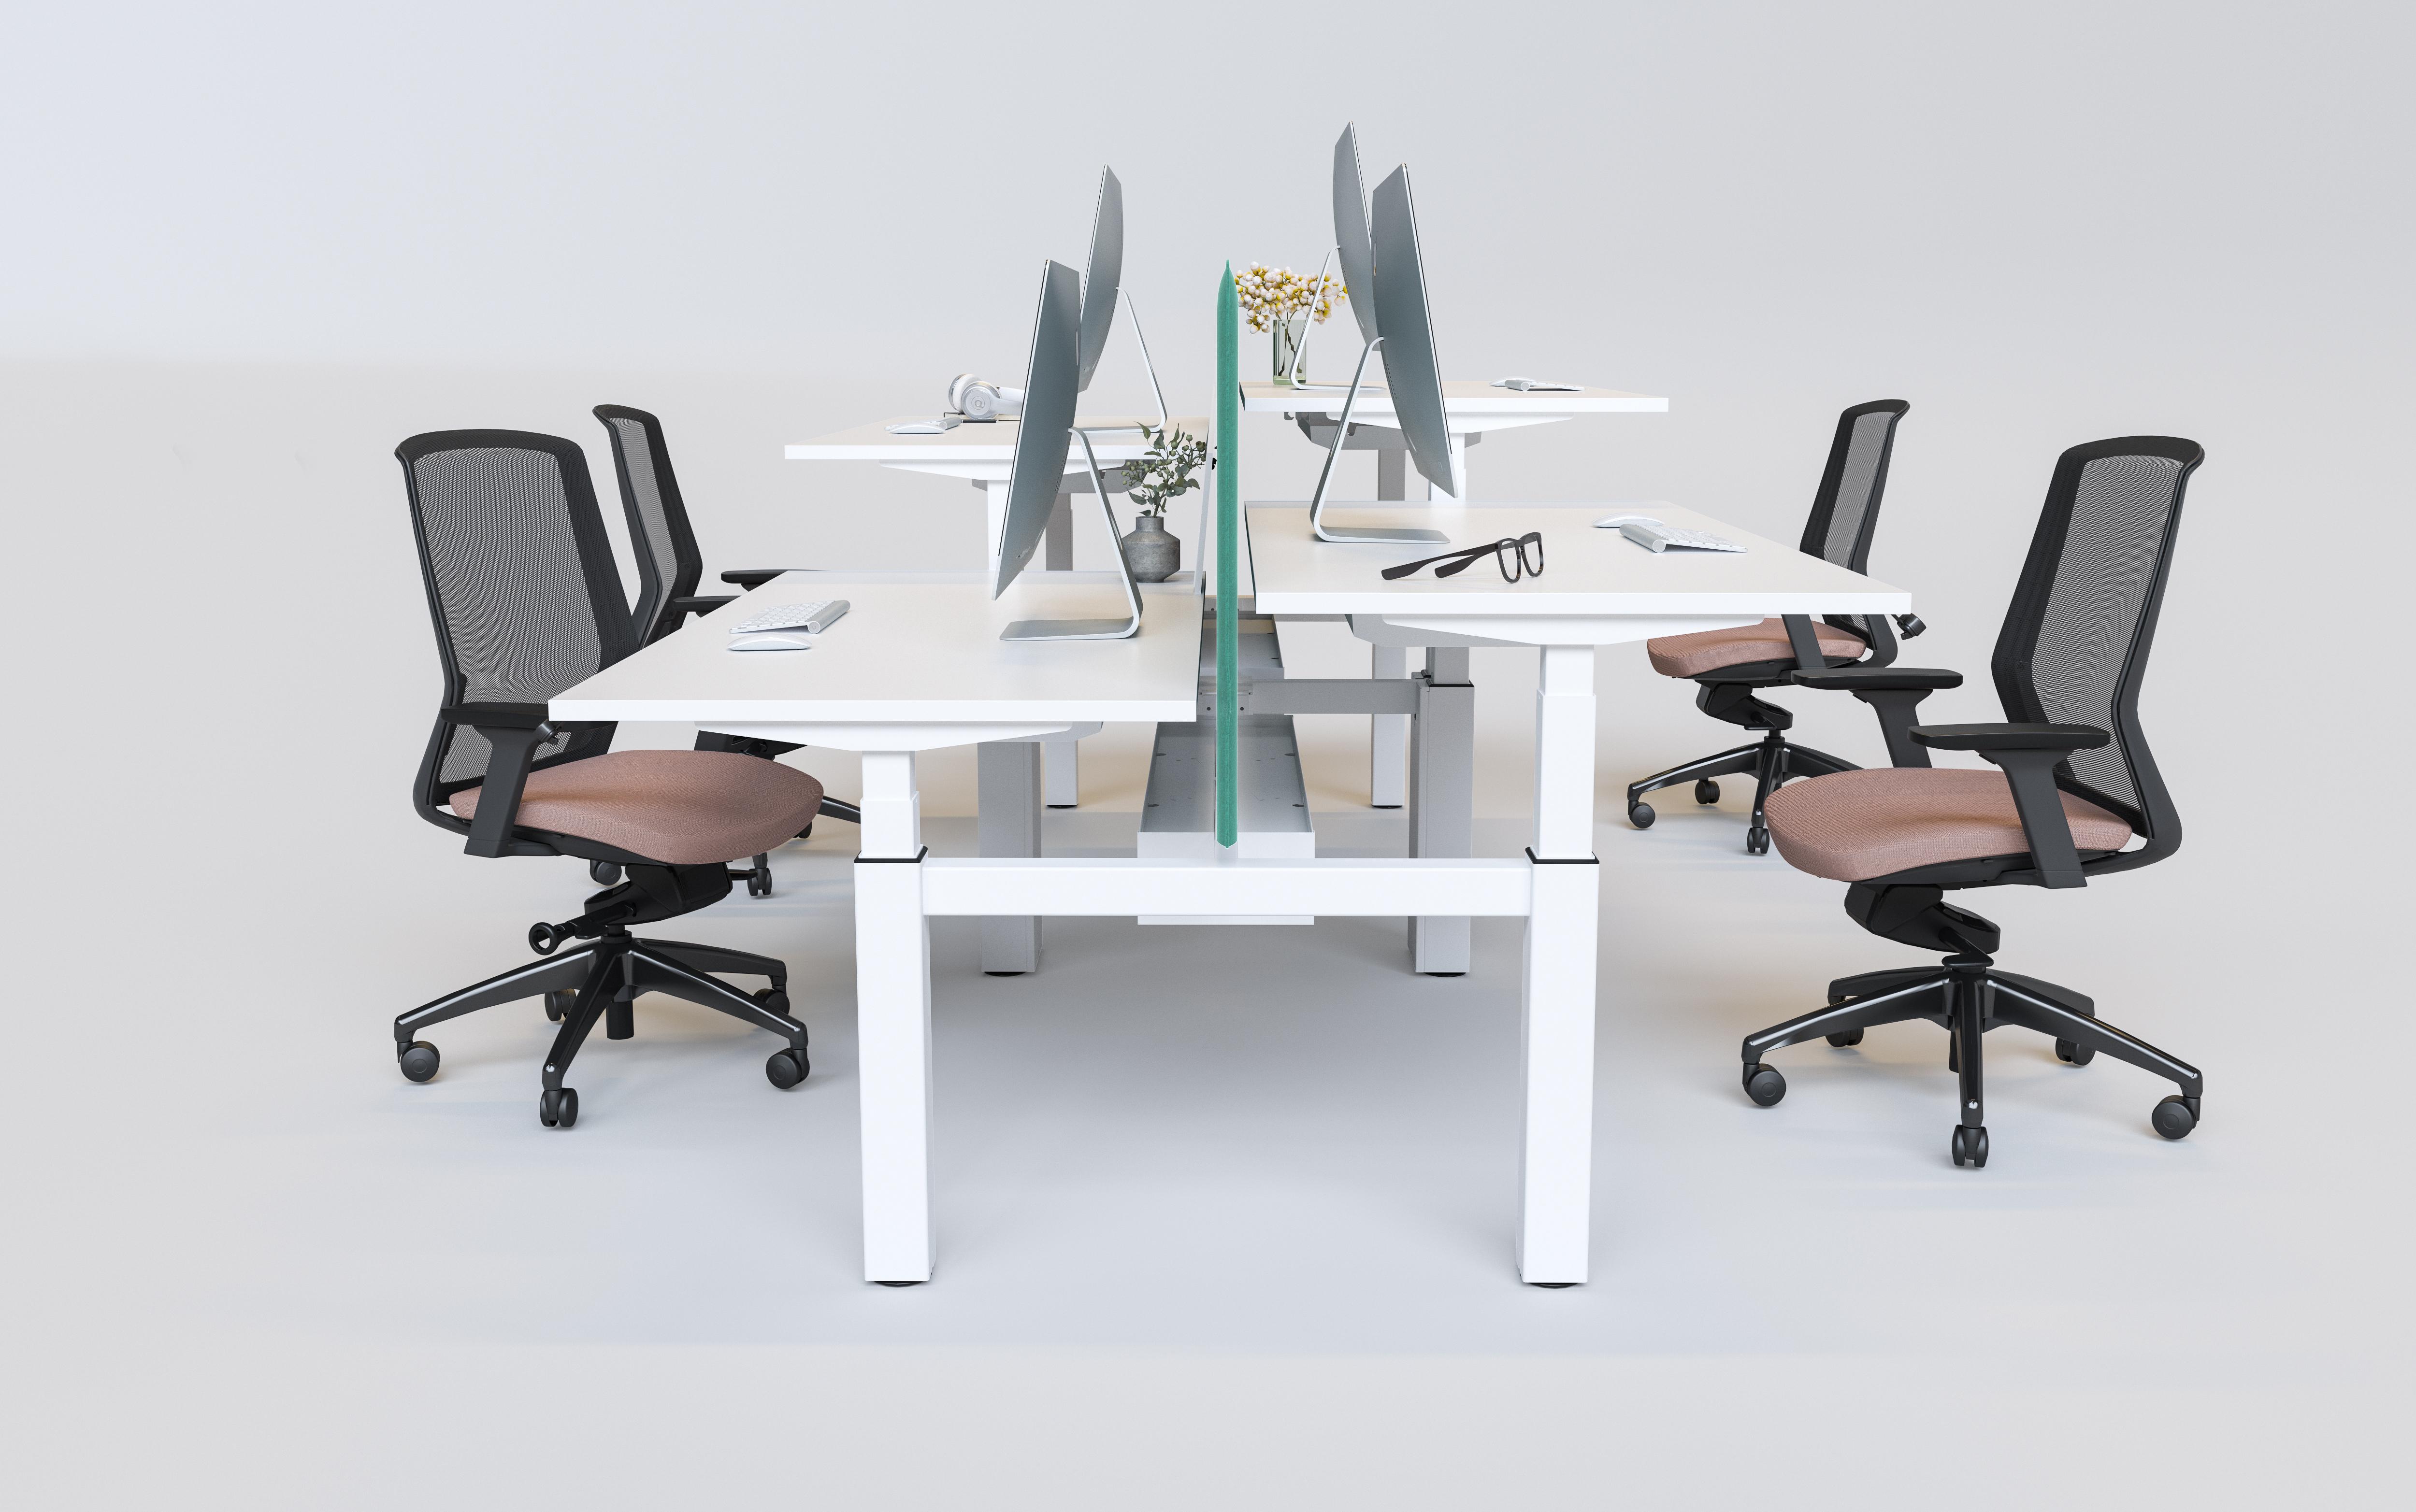 Bench_desk_set-up_Rev_A_view_02